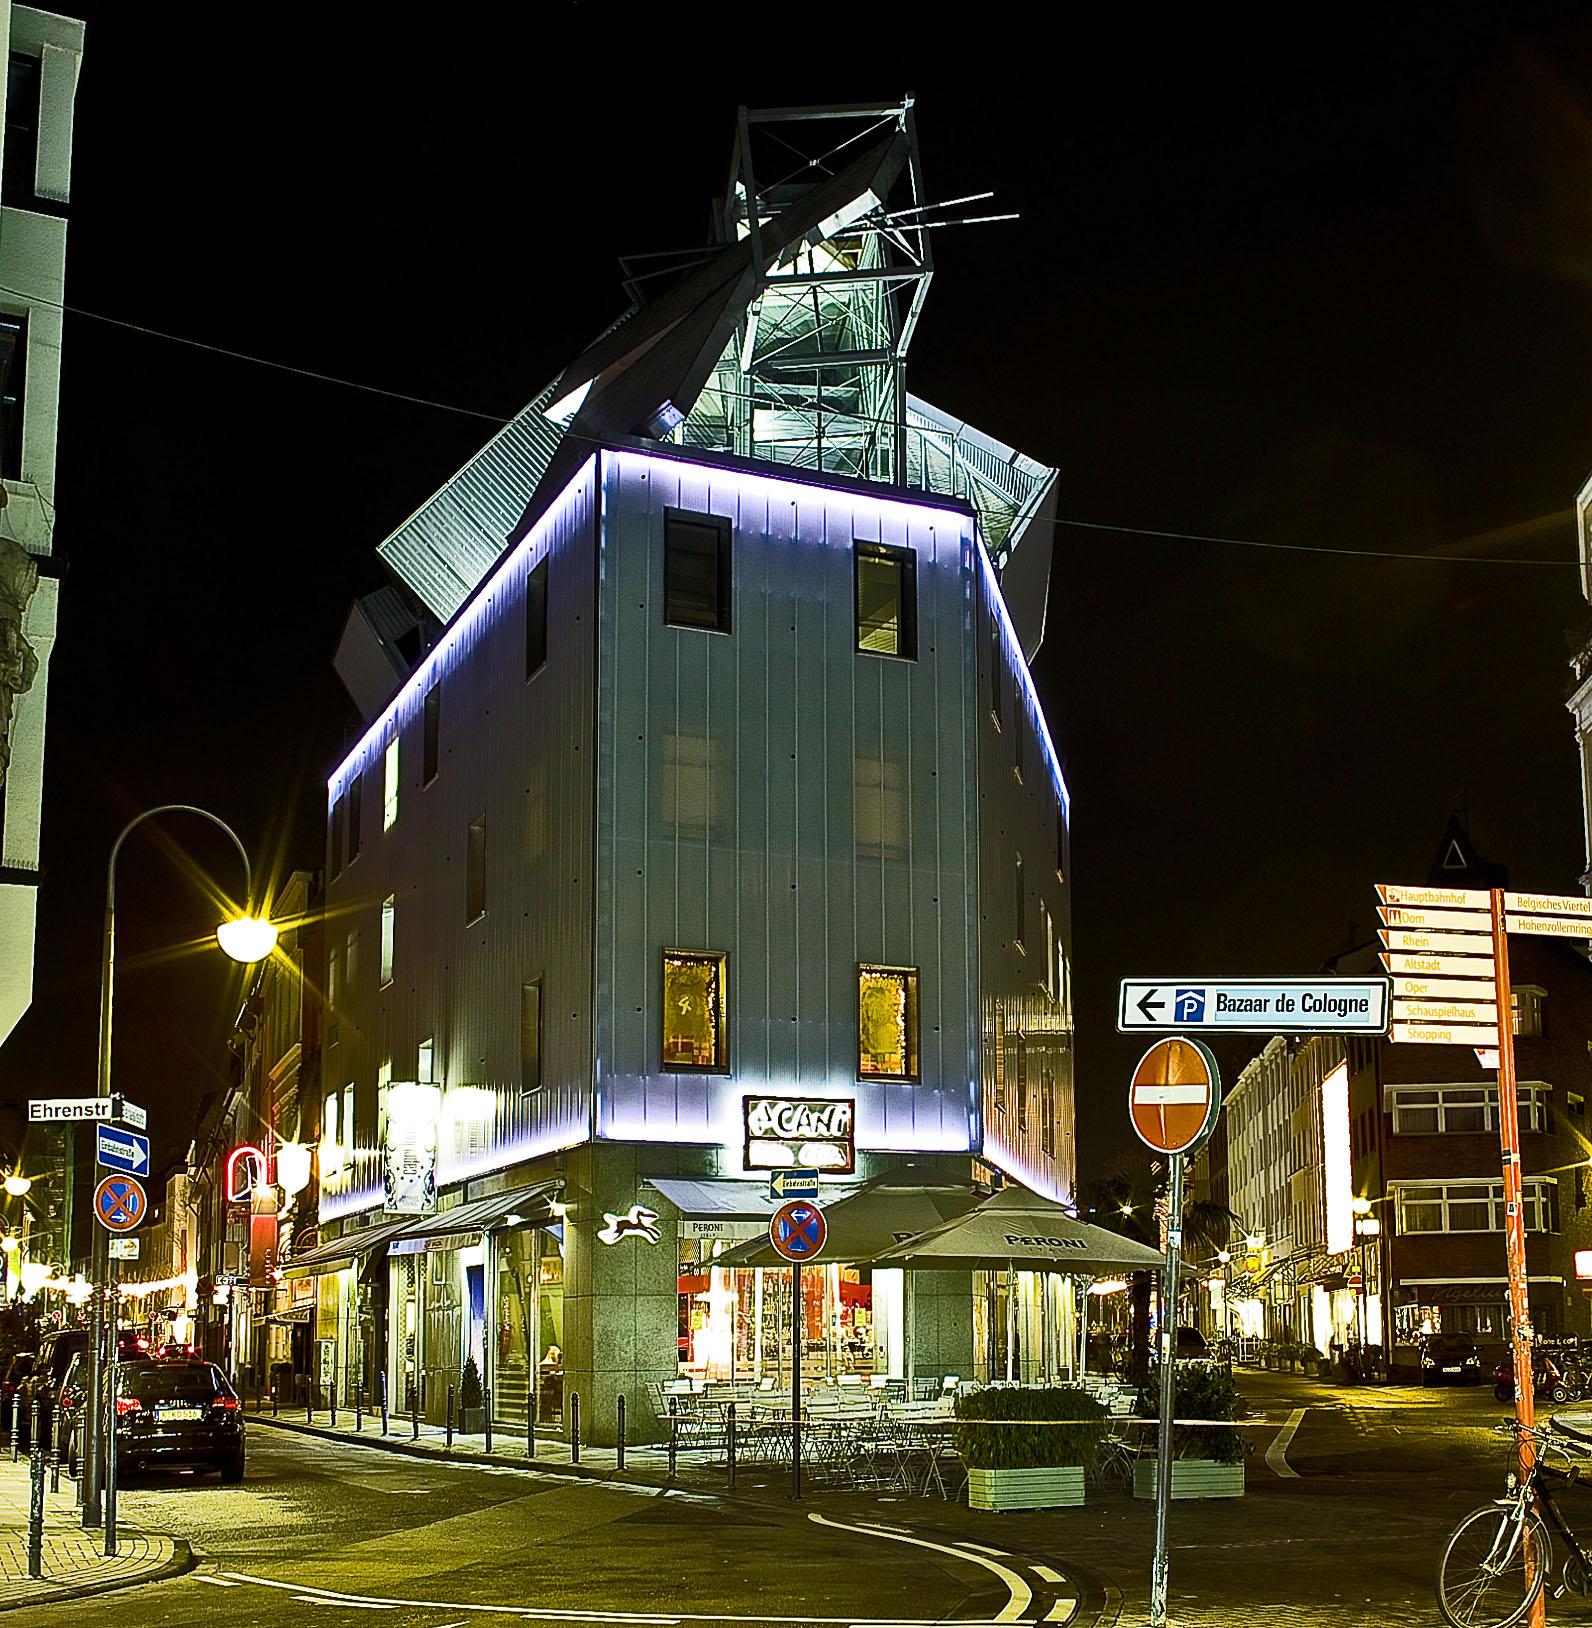 4Cani Restaurant